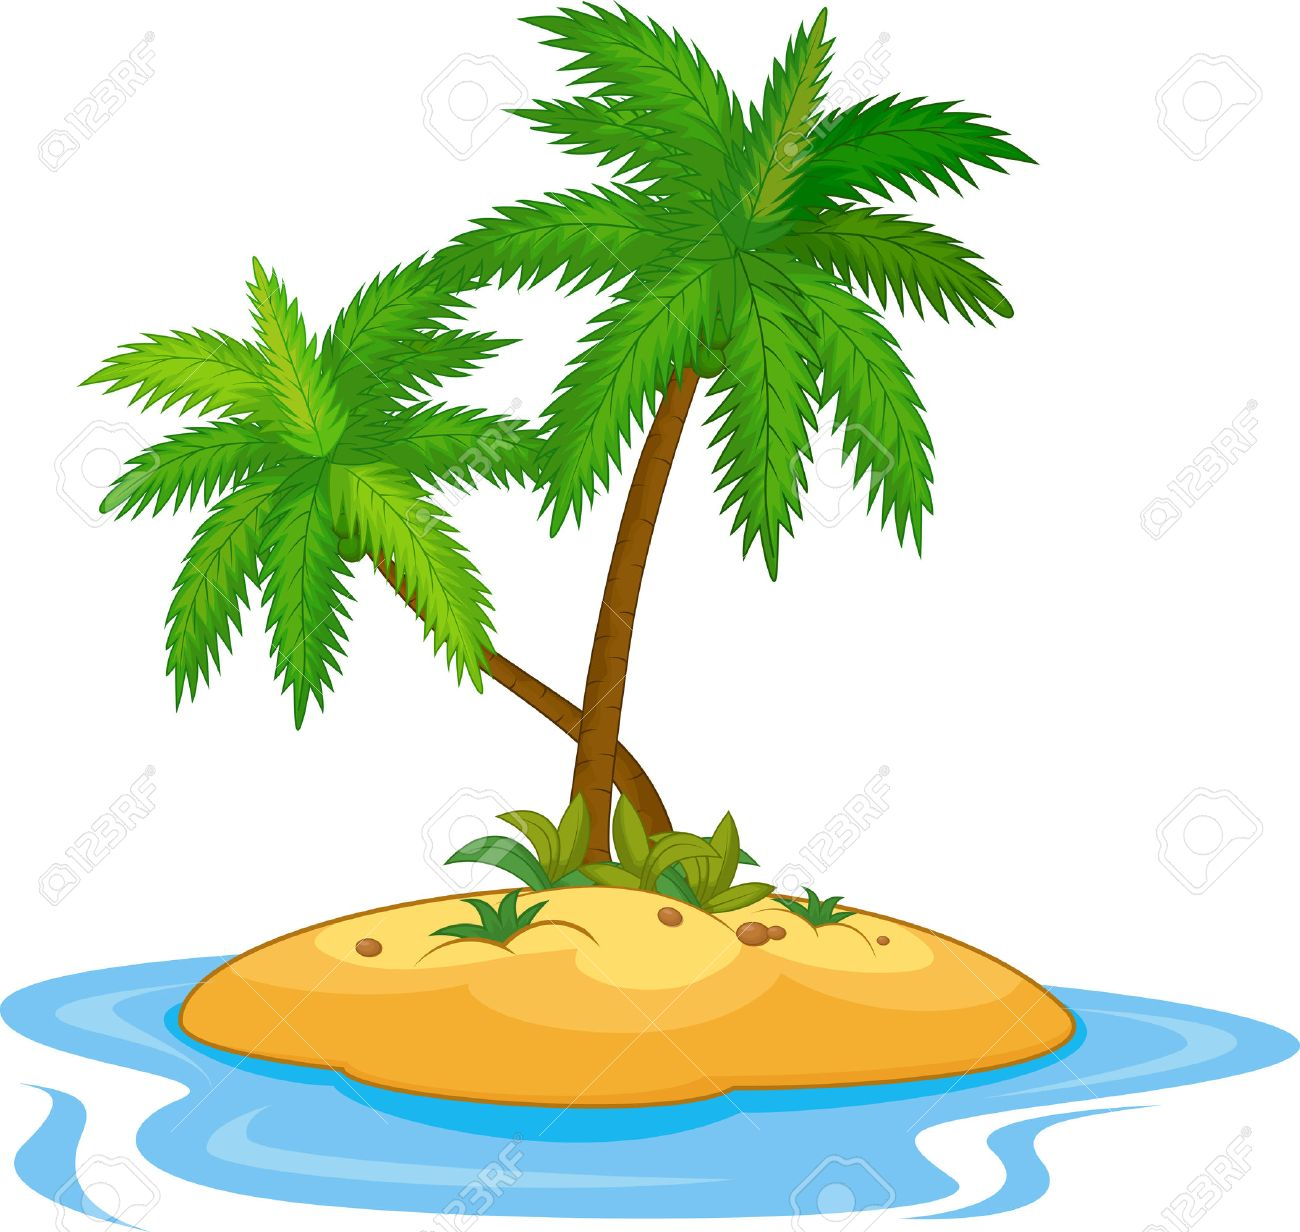 Tropical island cartoon.